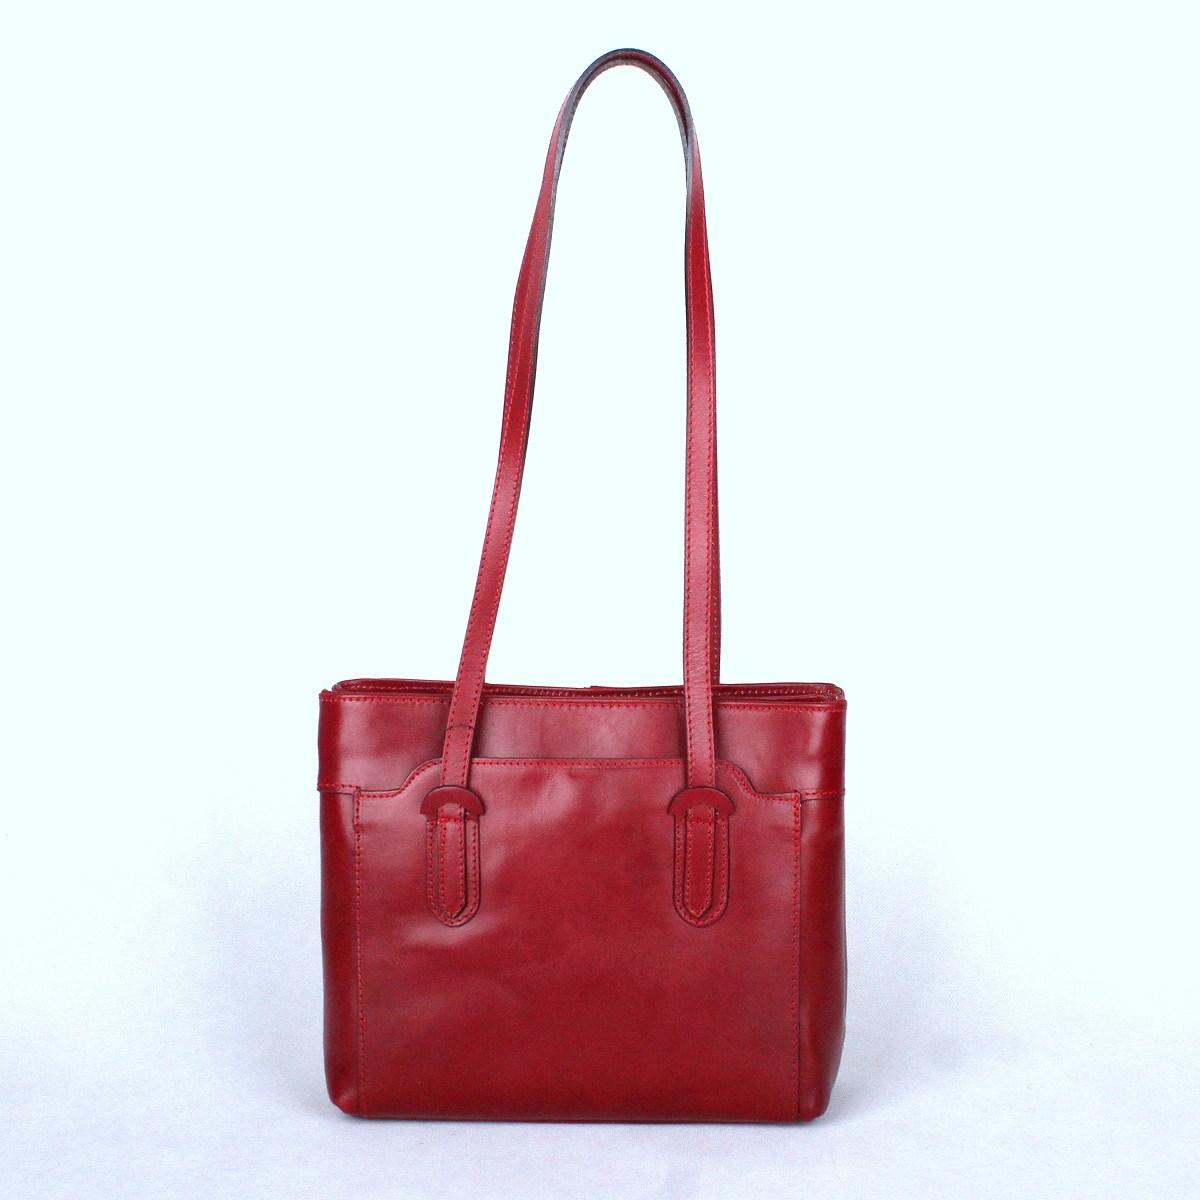 Tříoddílová tmavěčervená kožená kabelka na rameno no. 99  45c3e0d247